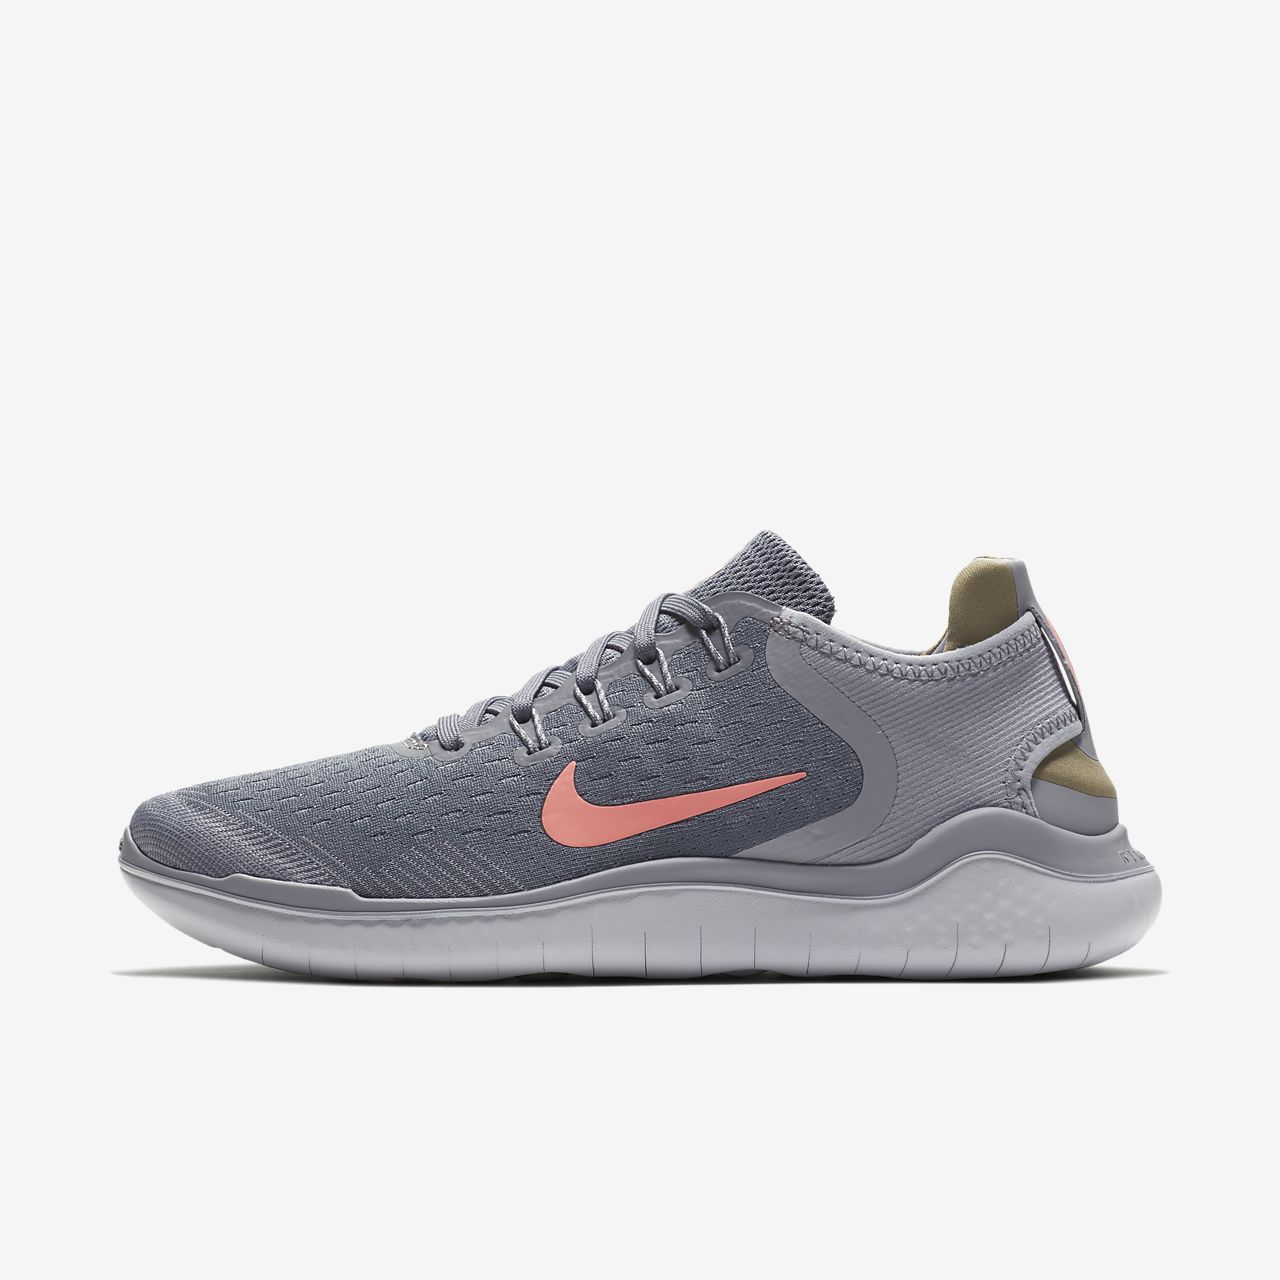 ... Chaussure de running Nike Free RN 2018 pour Femme